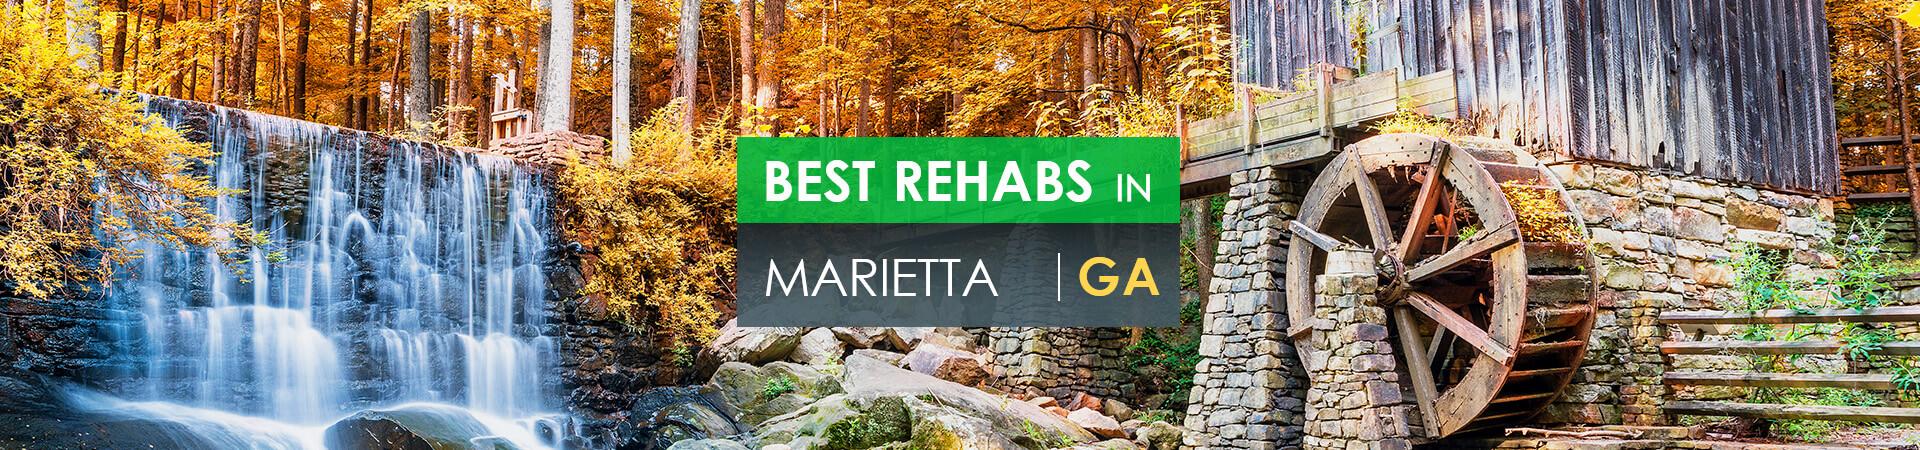 Best rehabs in Marietta, GA